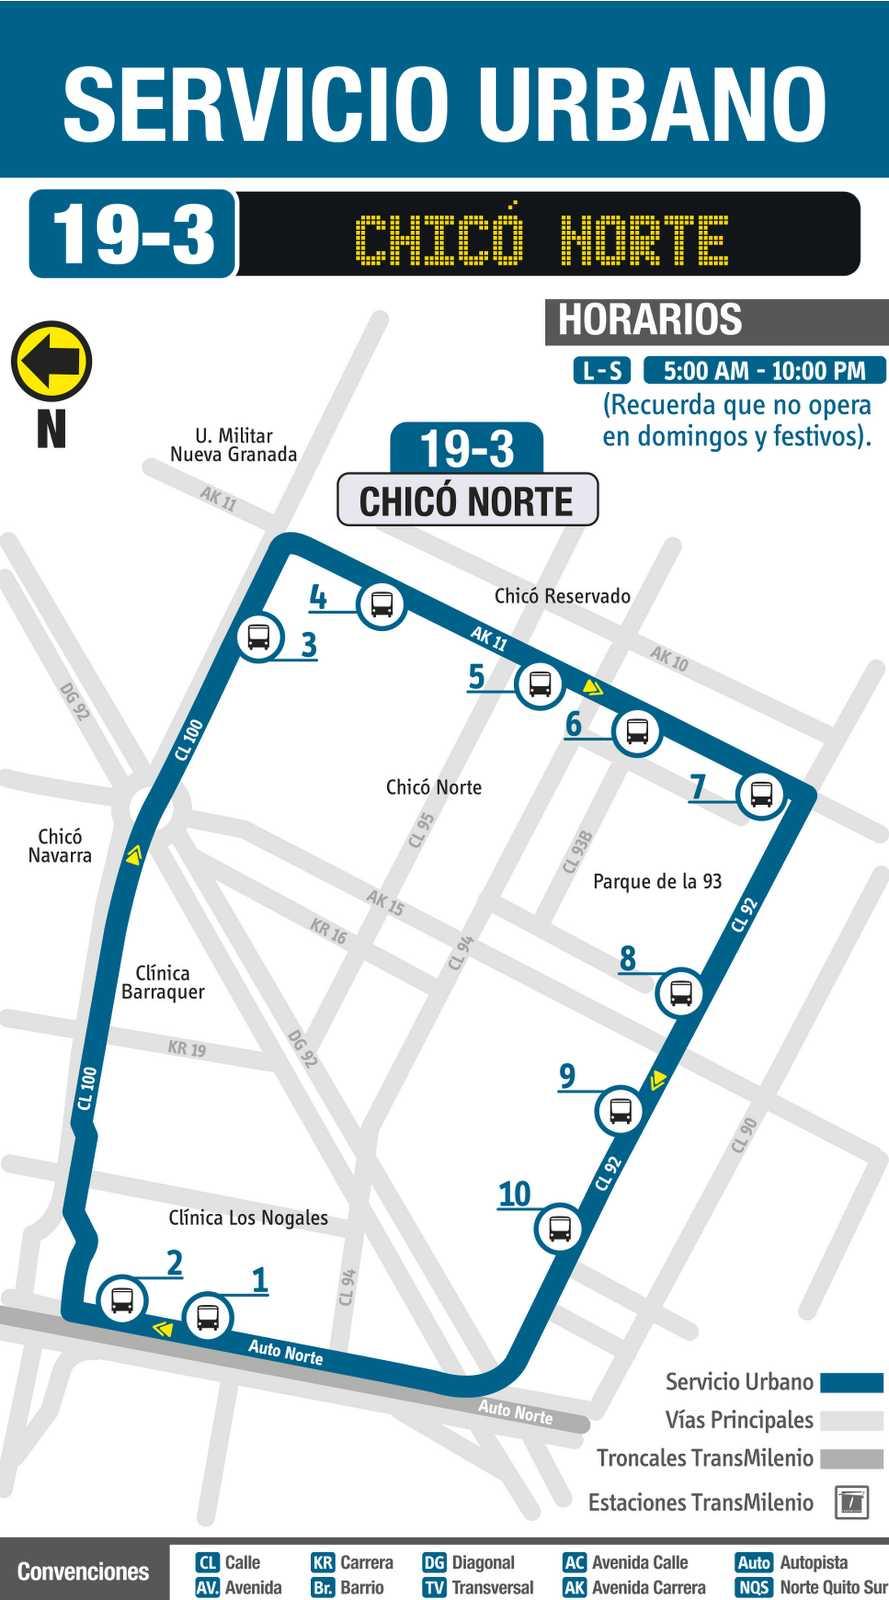 Ruta SITP: 19-3 Chicó Norte (mapa)